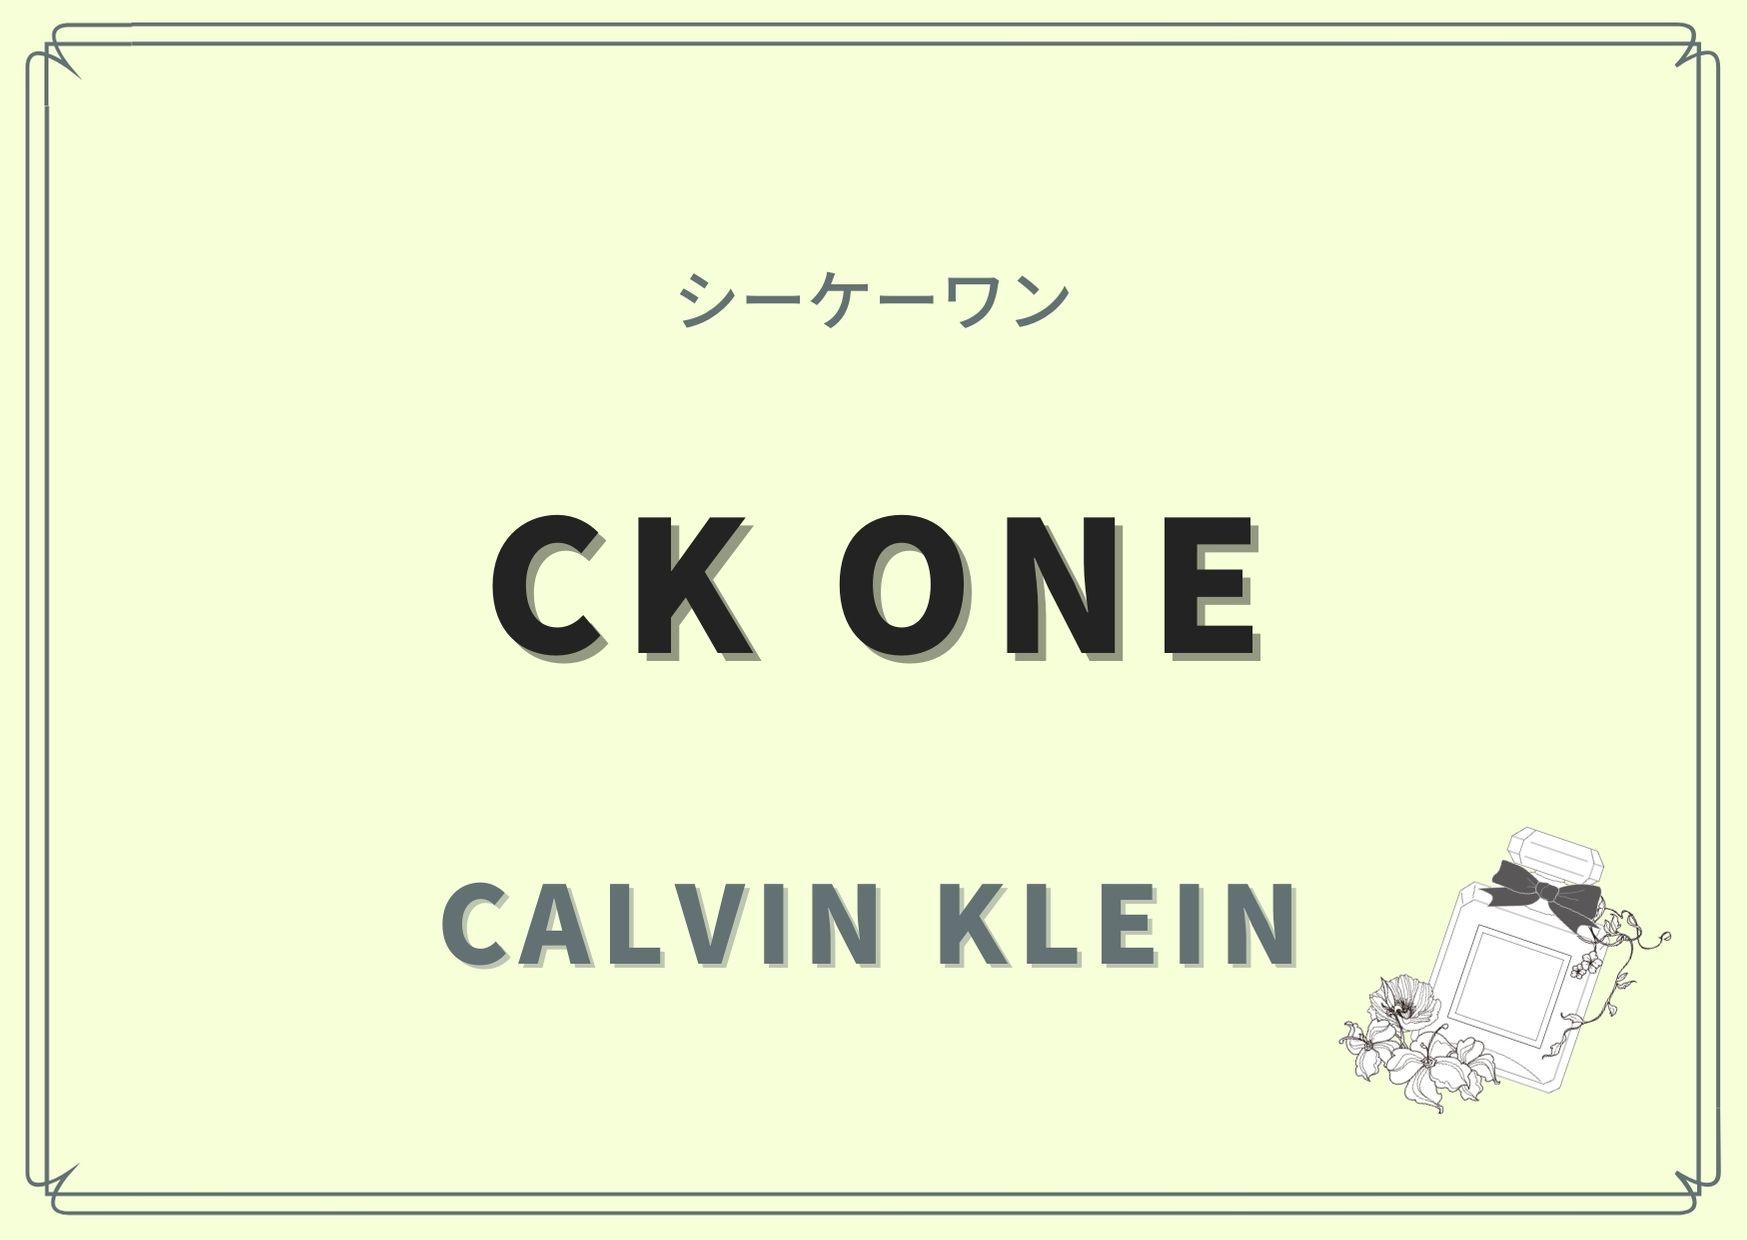 CK ONE(シーケーワン)/Calvin Klein(カルバン クライン)